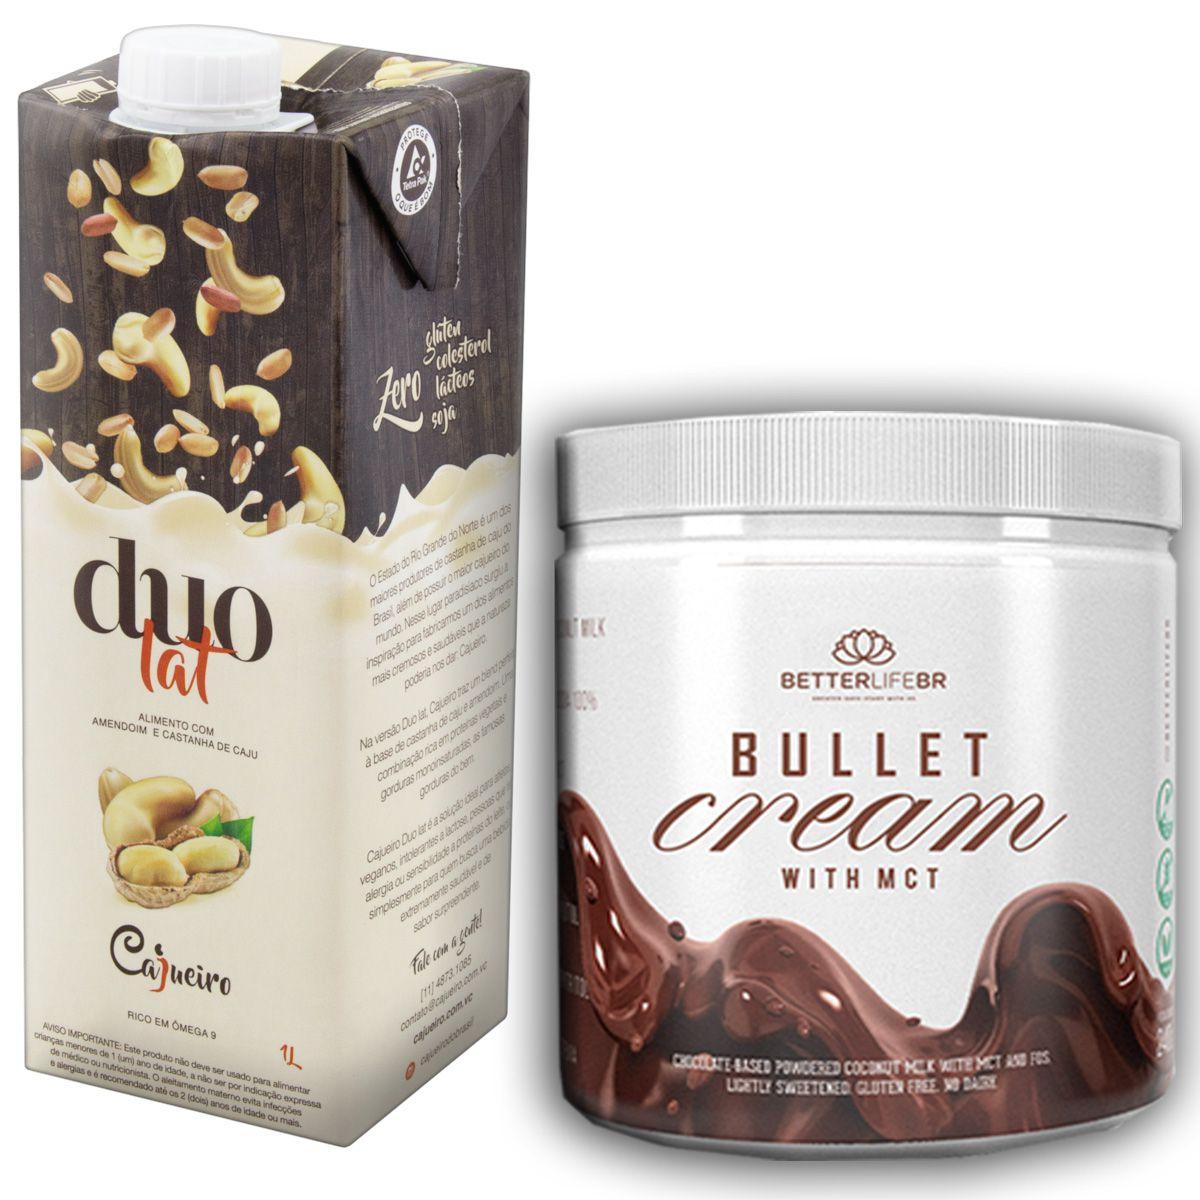 1 Bullet Cream com MCT 240g e 1 Leite Vegetal Duolat 1lt